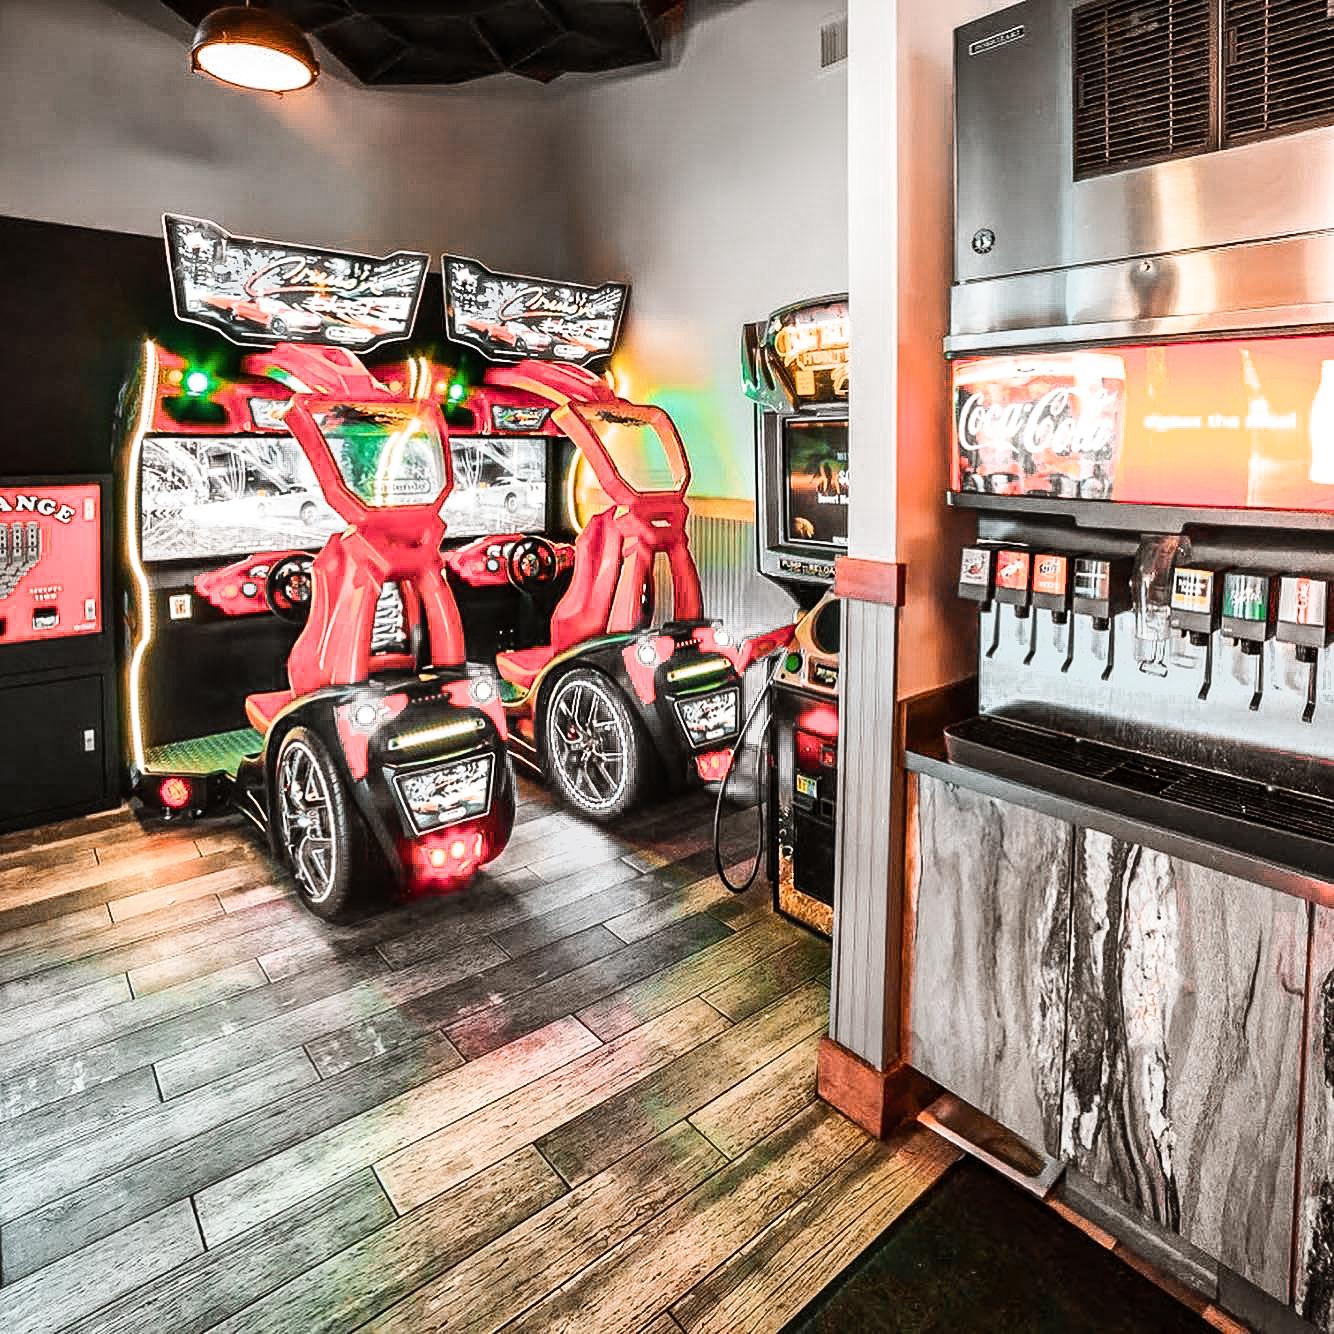 Porky's Pizza - Arcade Area